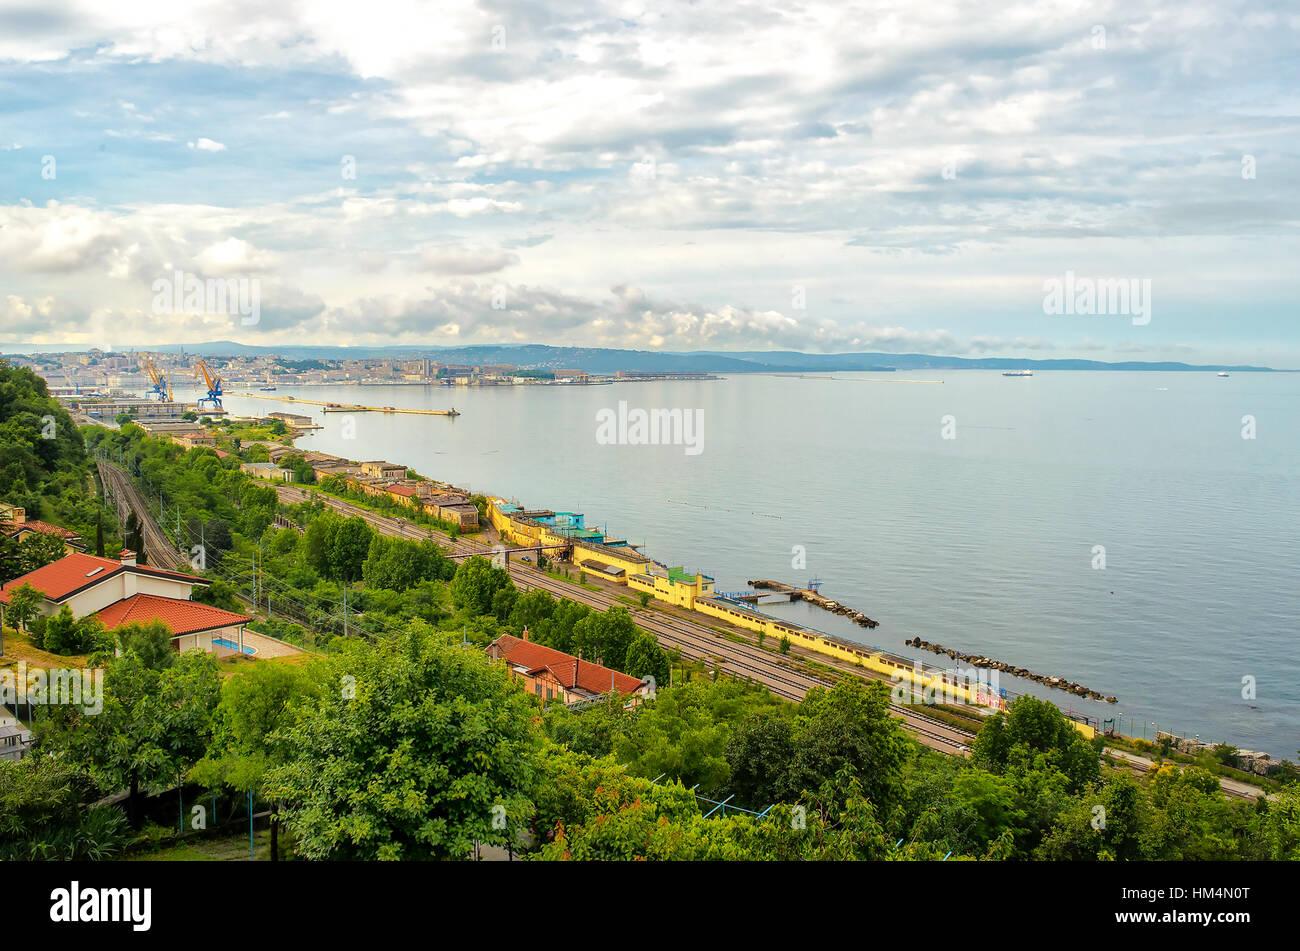 Gulf of Trieste Friuli Venezia Giulia Italy - Stock Image